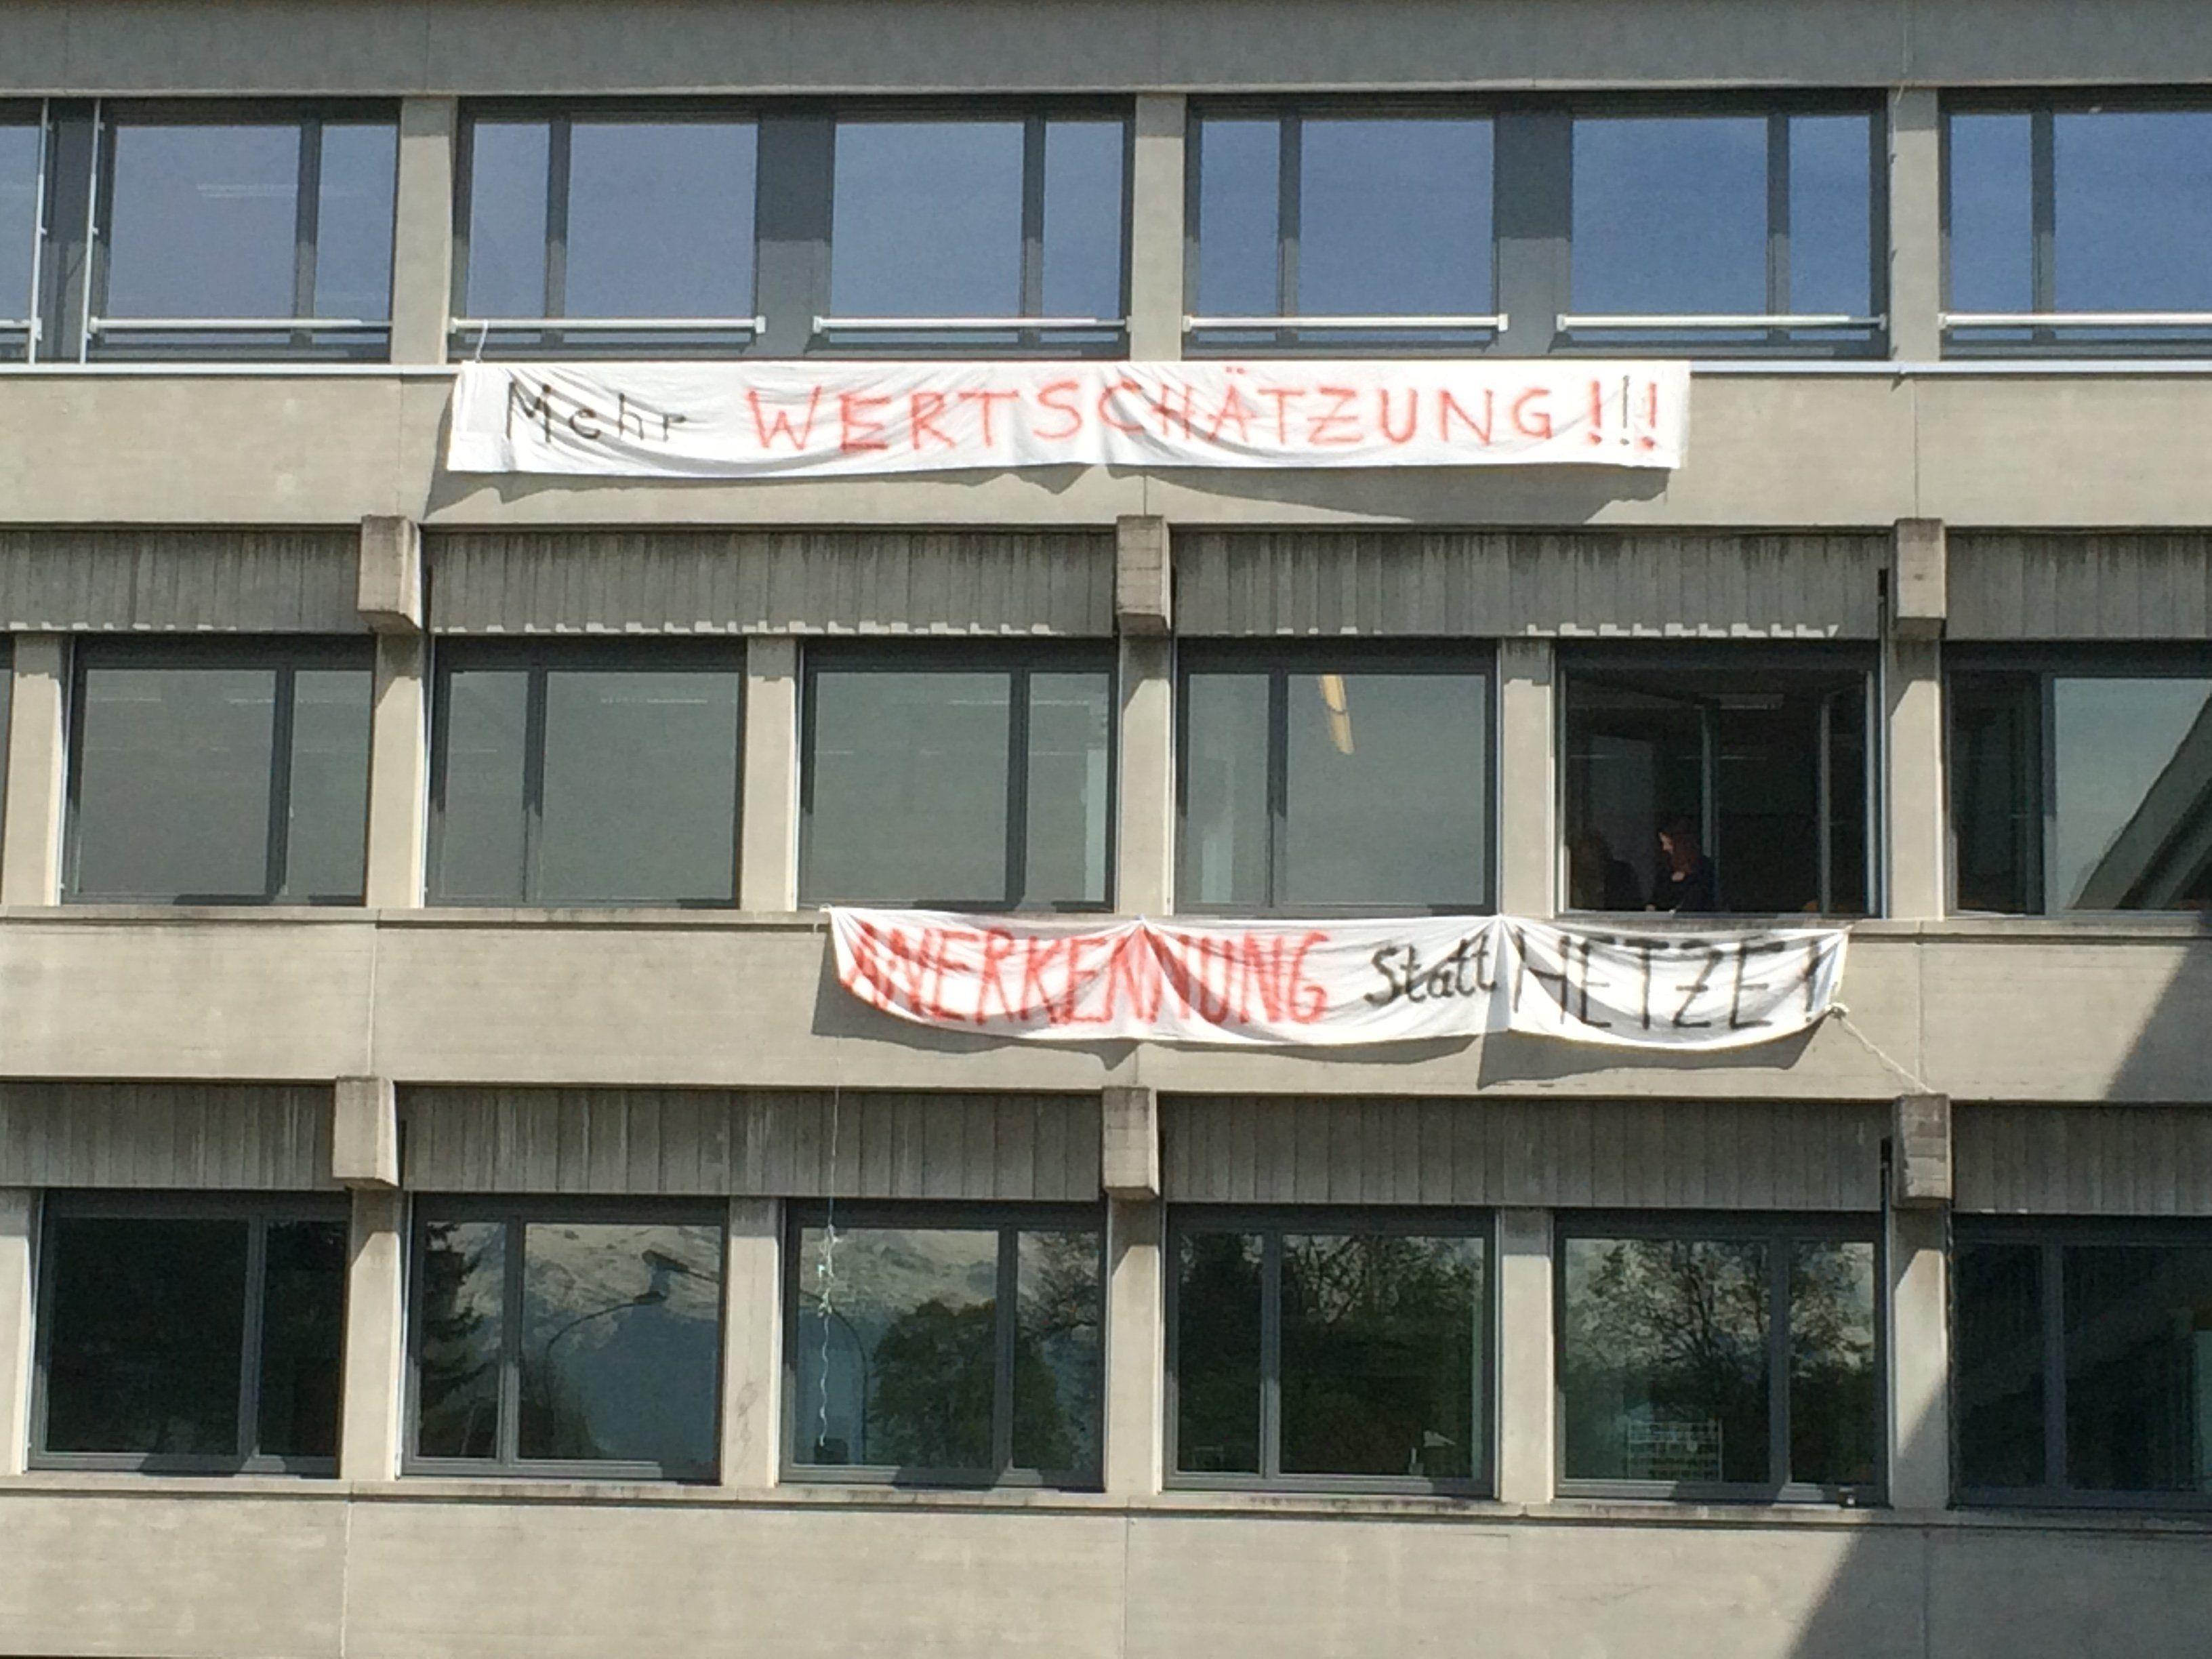 Lehrerprotest gegen Sparmaßnahmen.